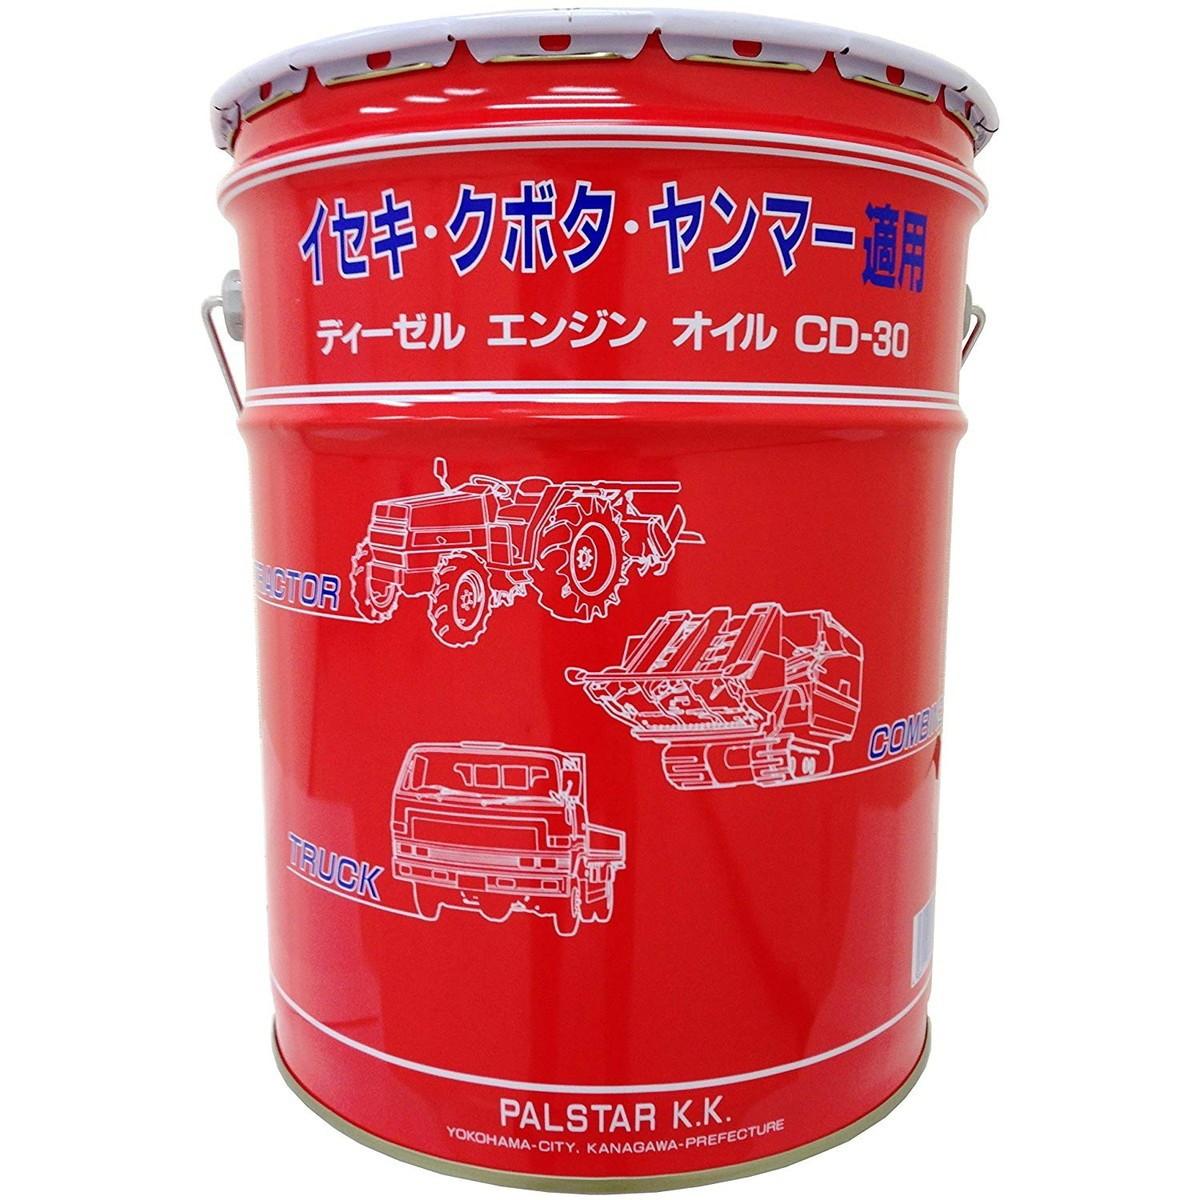 GENTS 農耕用ディーゼル 20L CD-30【クーポン配布中】